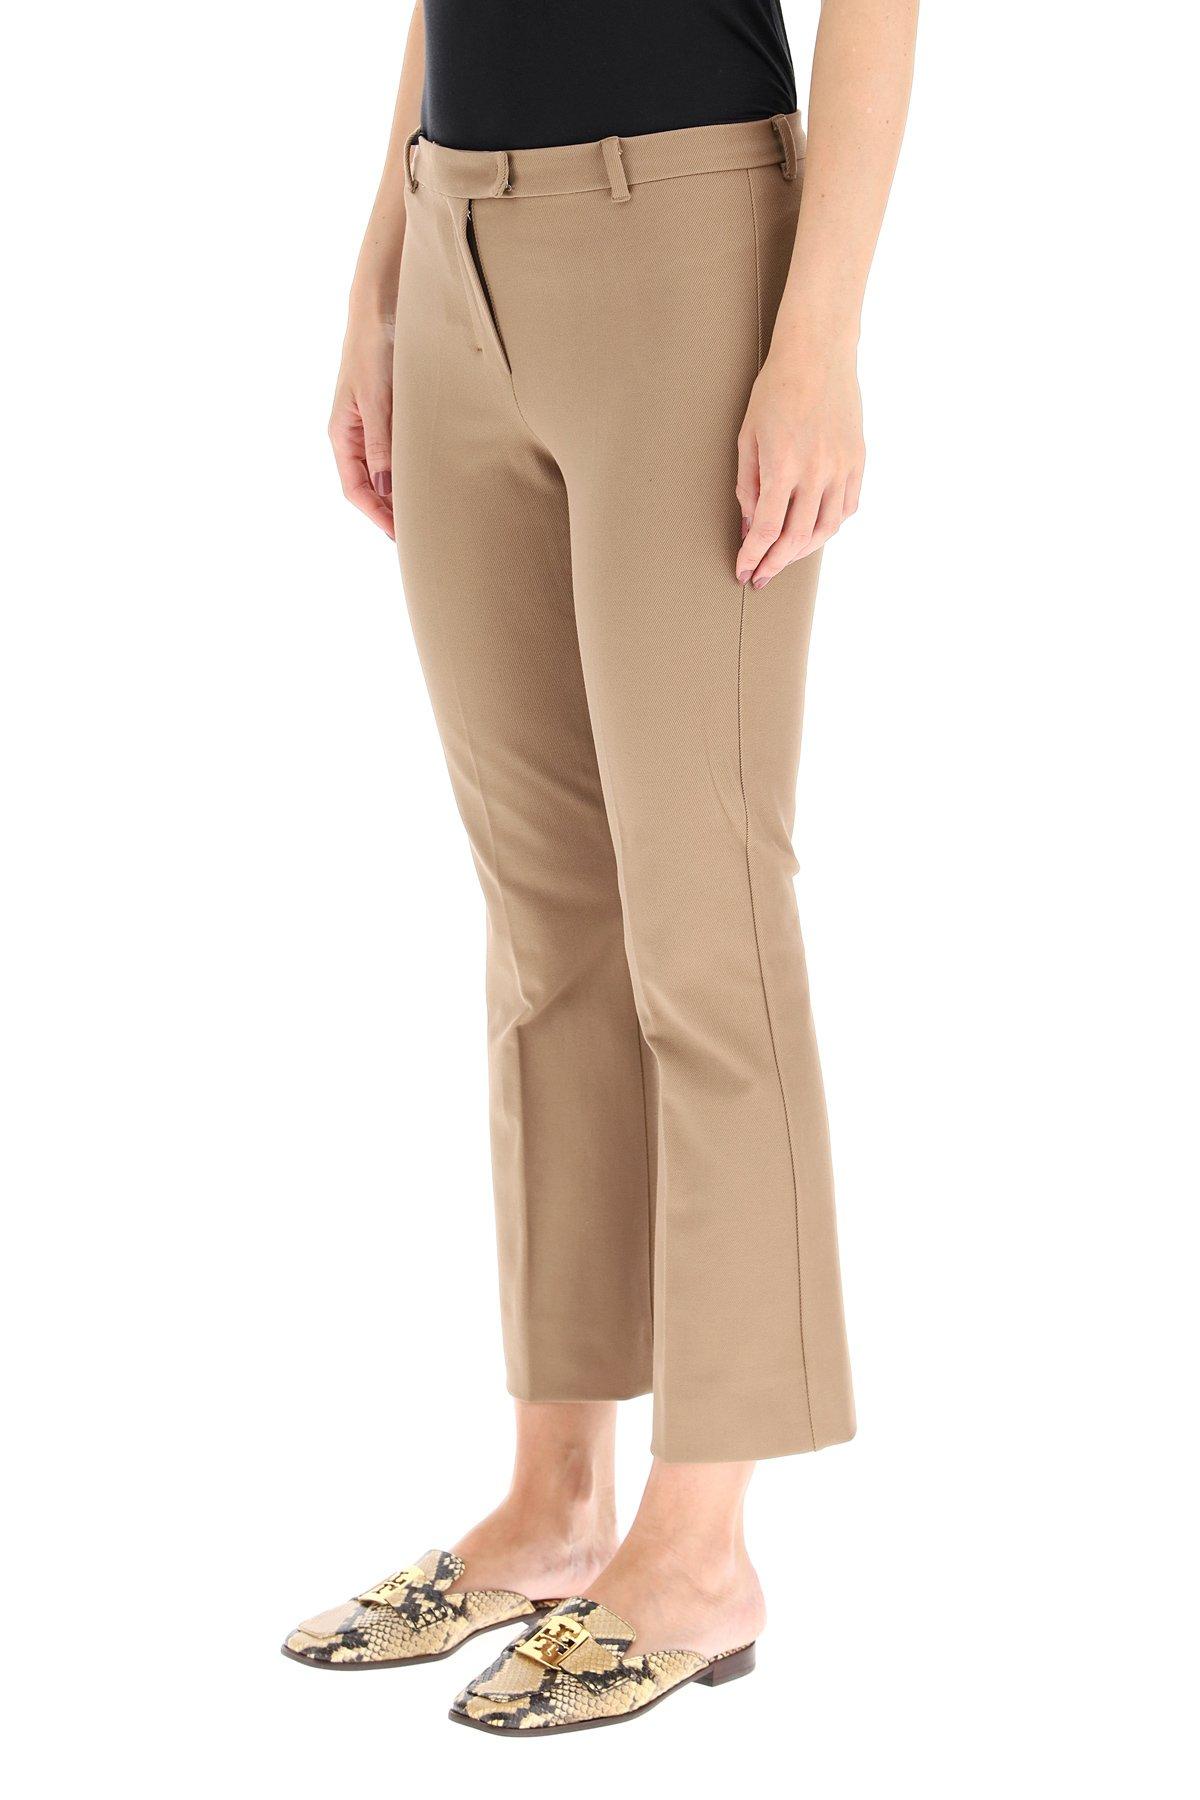 's max mara pantaloni umanita crop